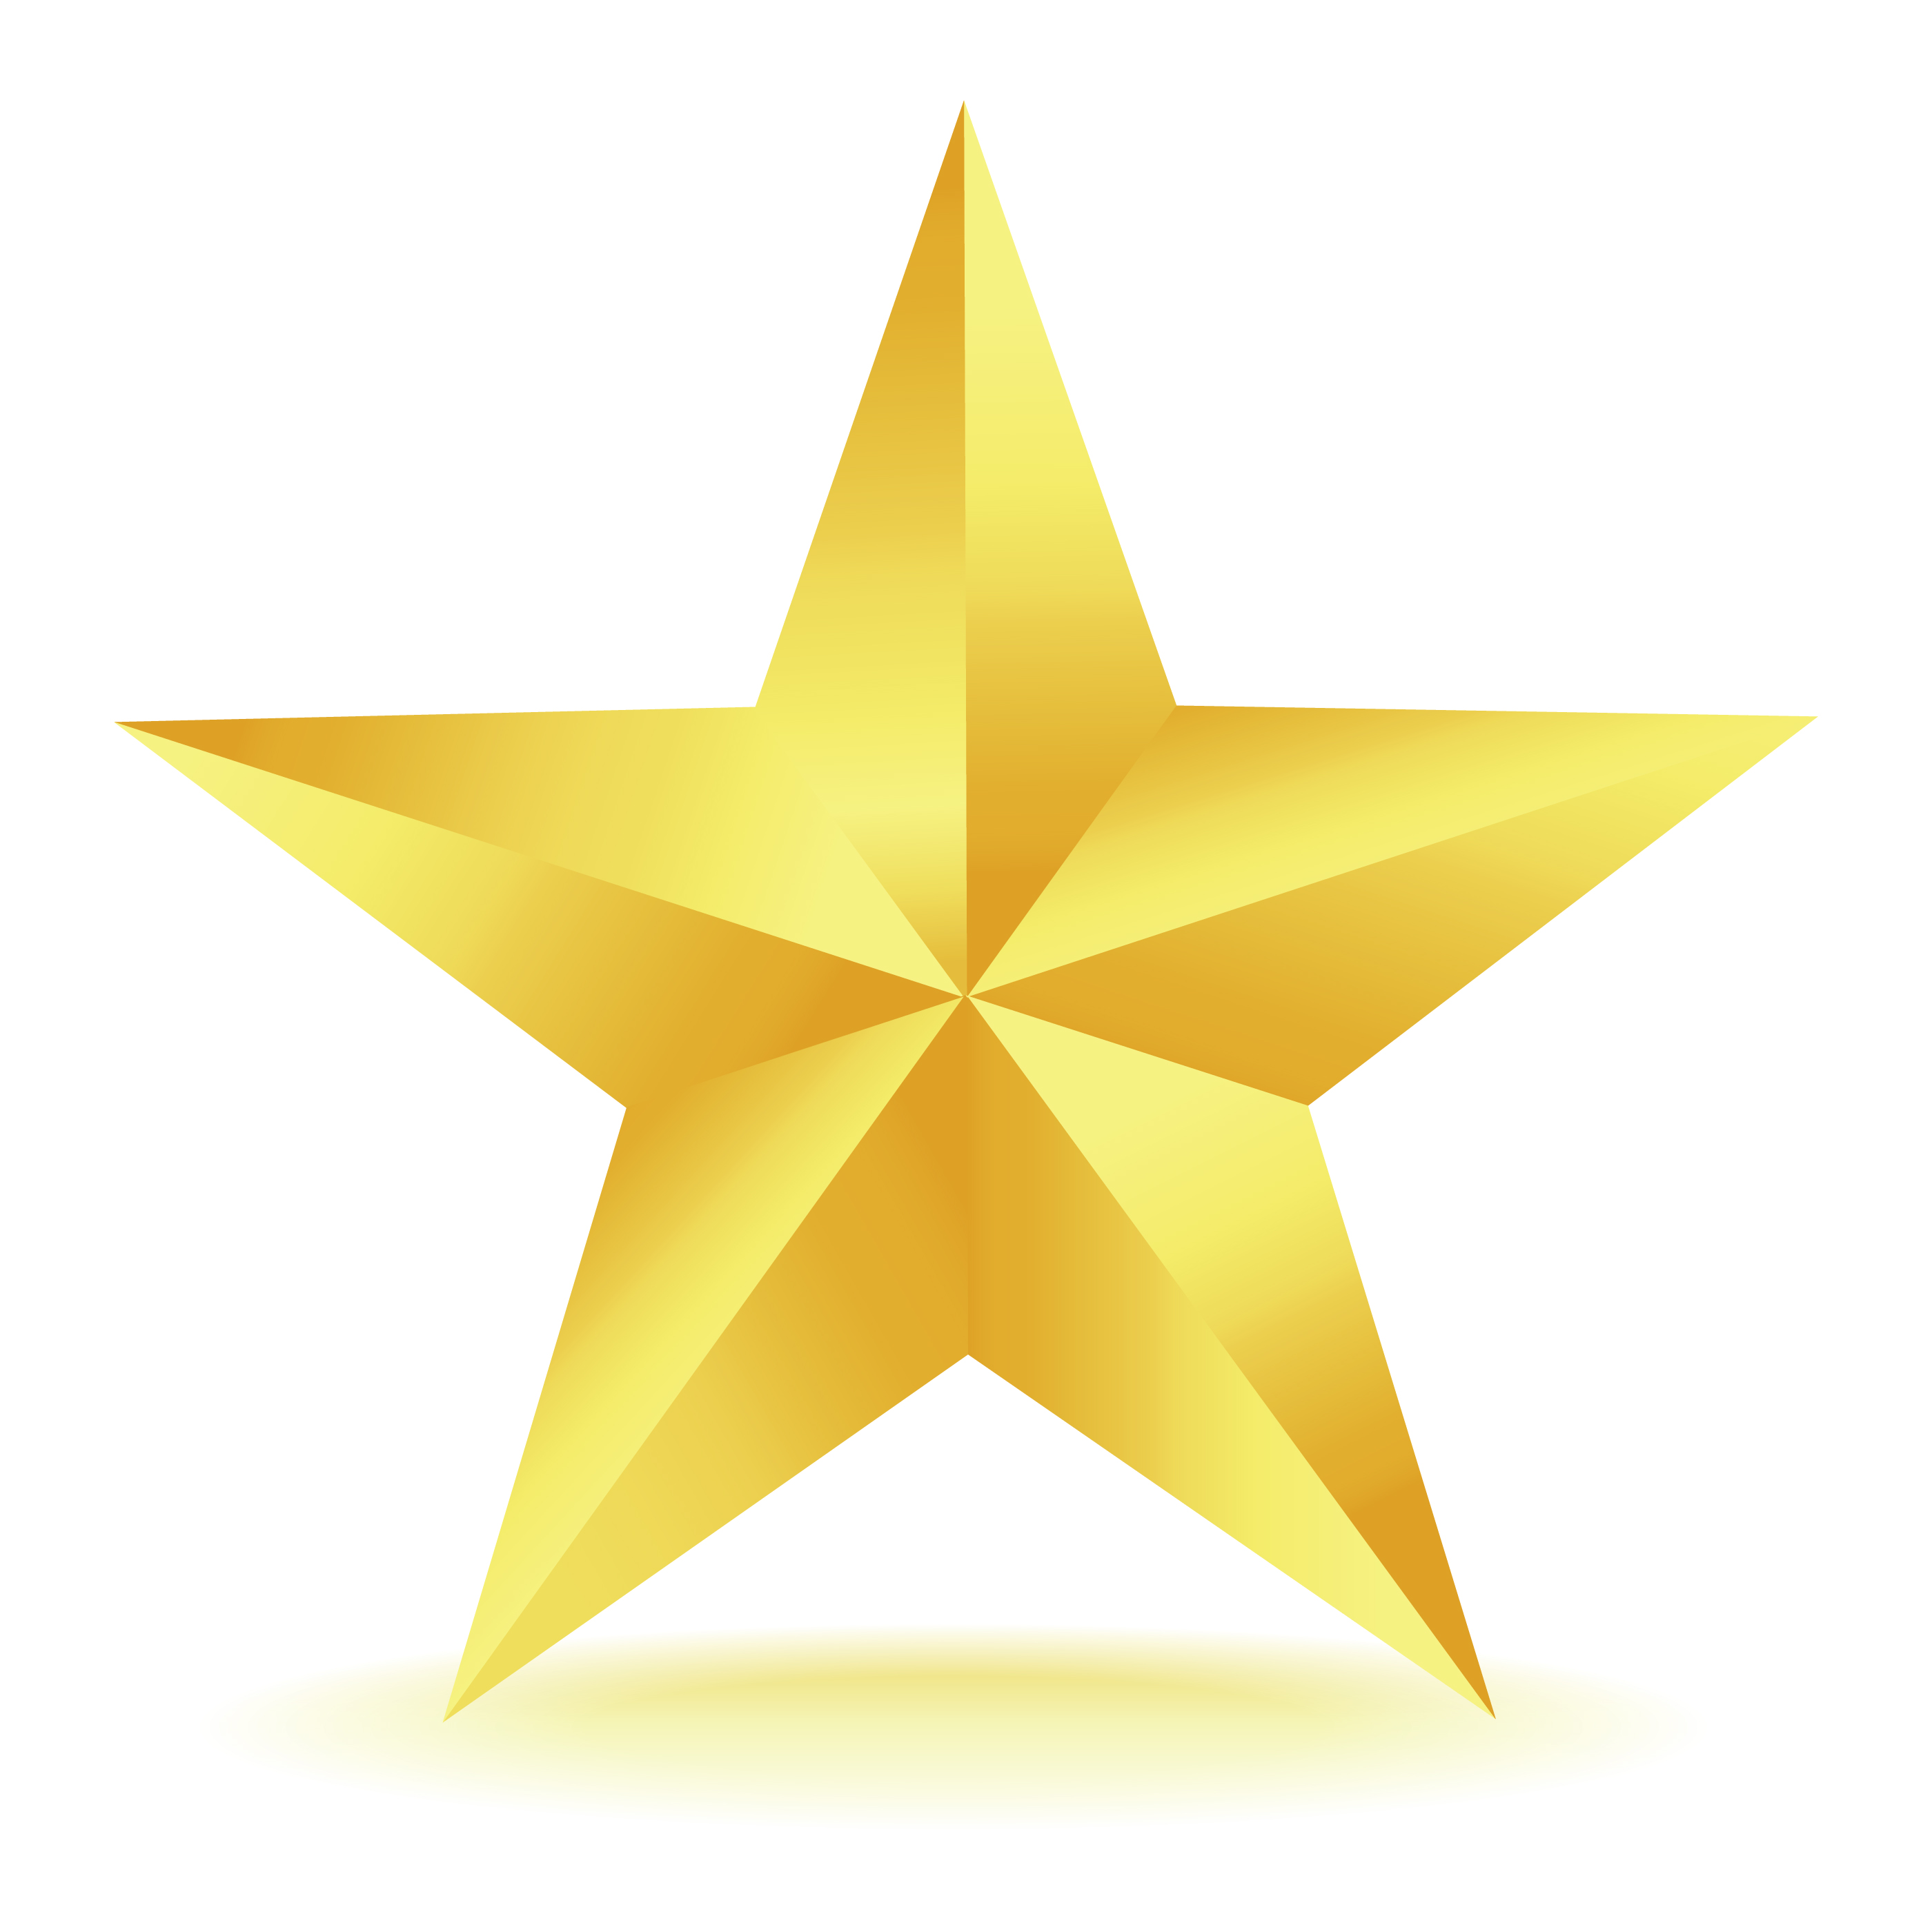 2800x2800 Gold Star Clipart 4